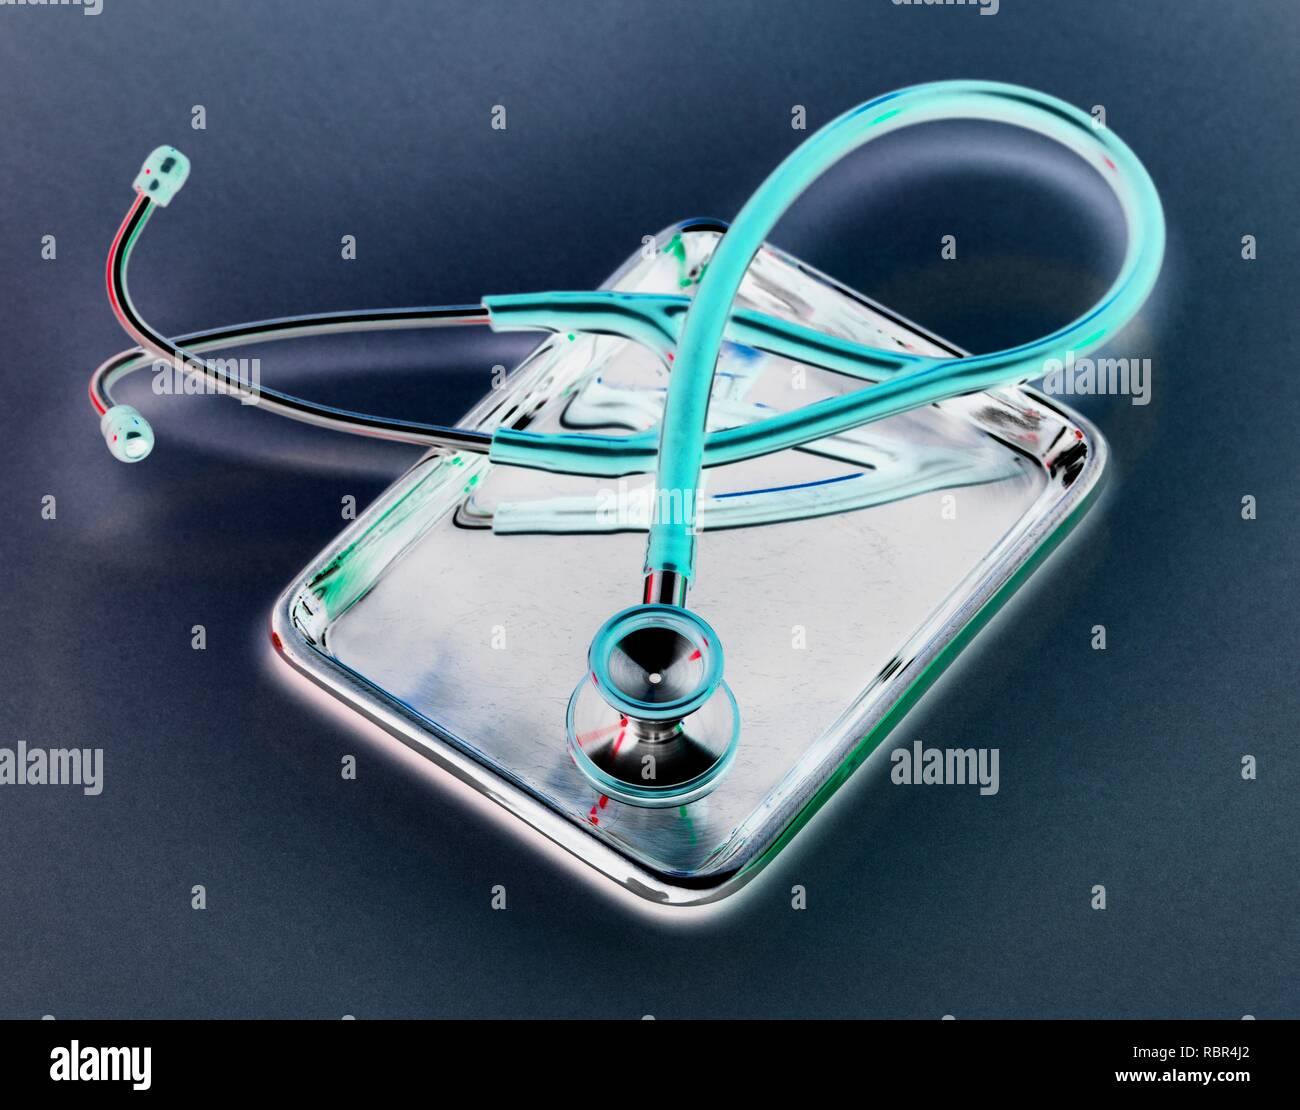 Stethoscope sitting on a medical tray. - Stock Image